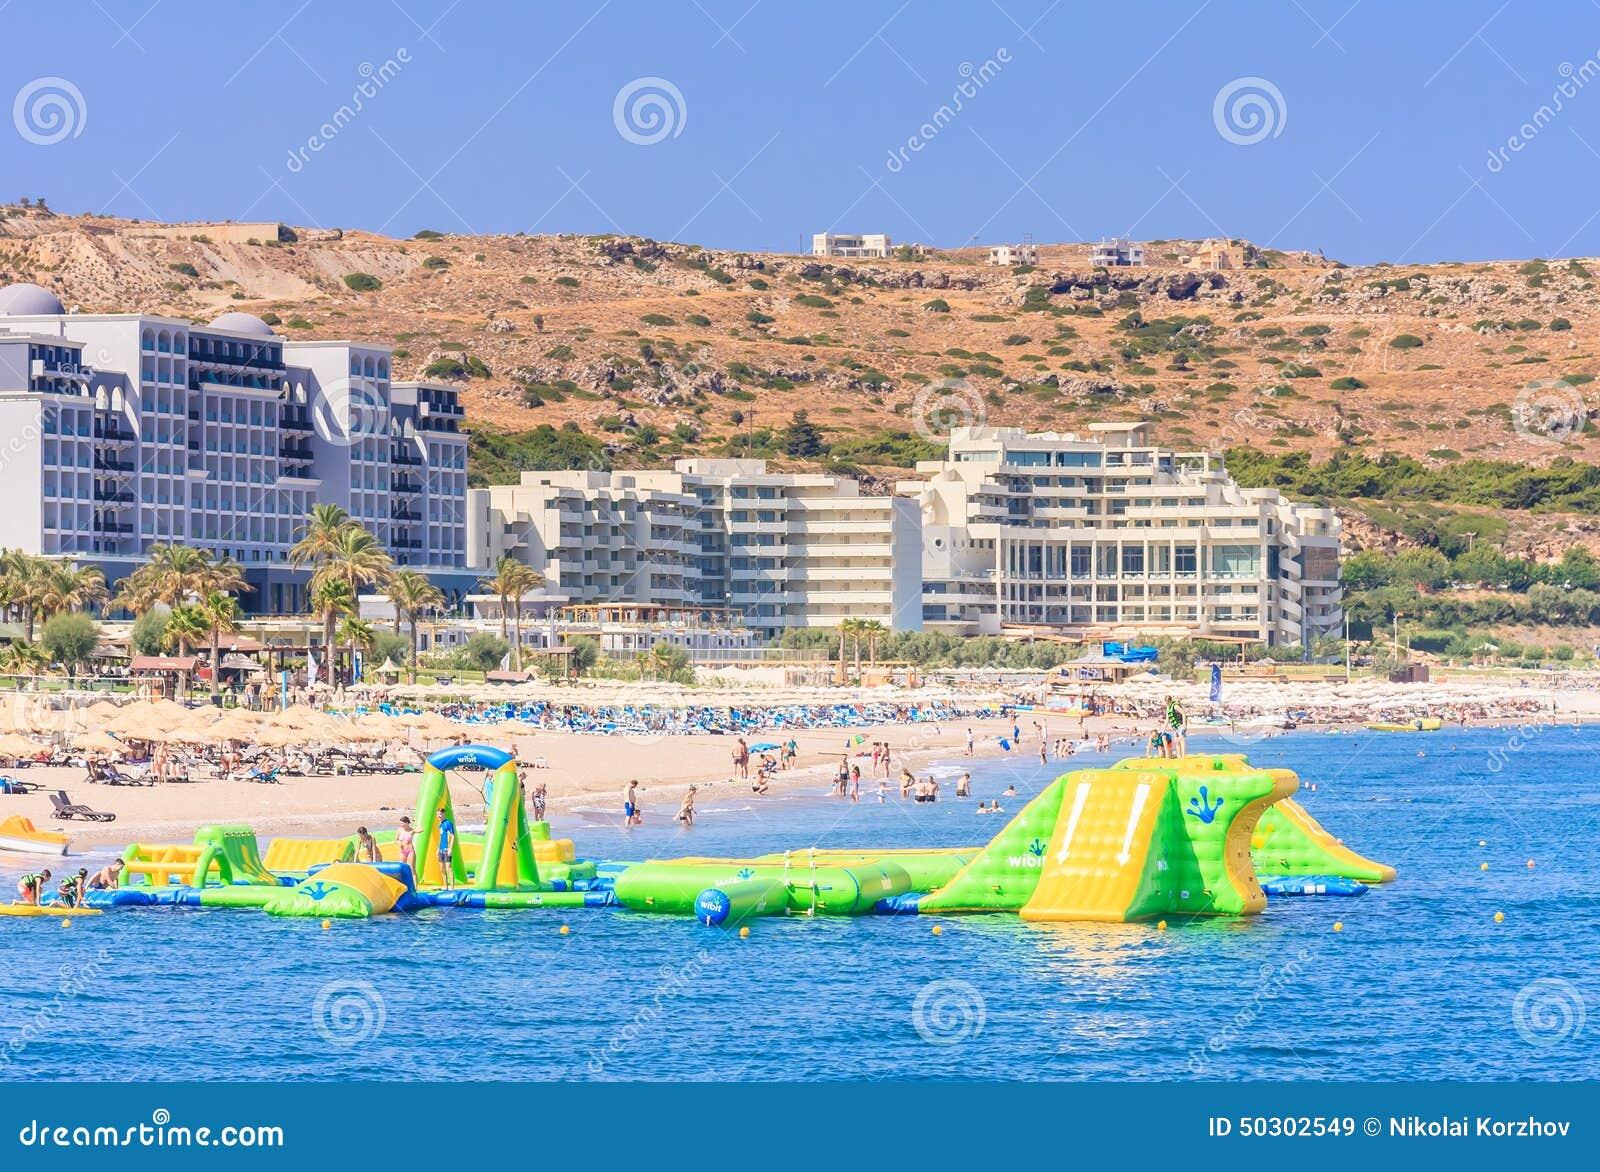 Vacation At Sea The Resort Faliraki Rhodes Island Greece Editorial Stock Image Image